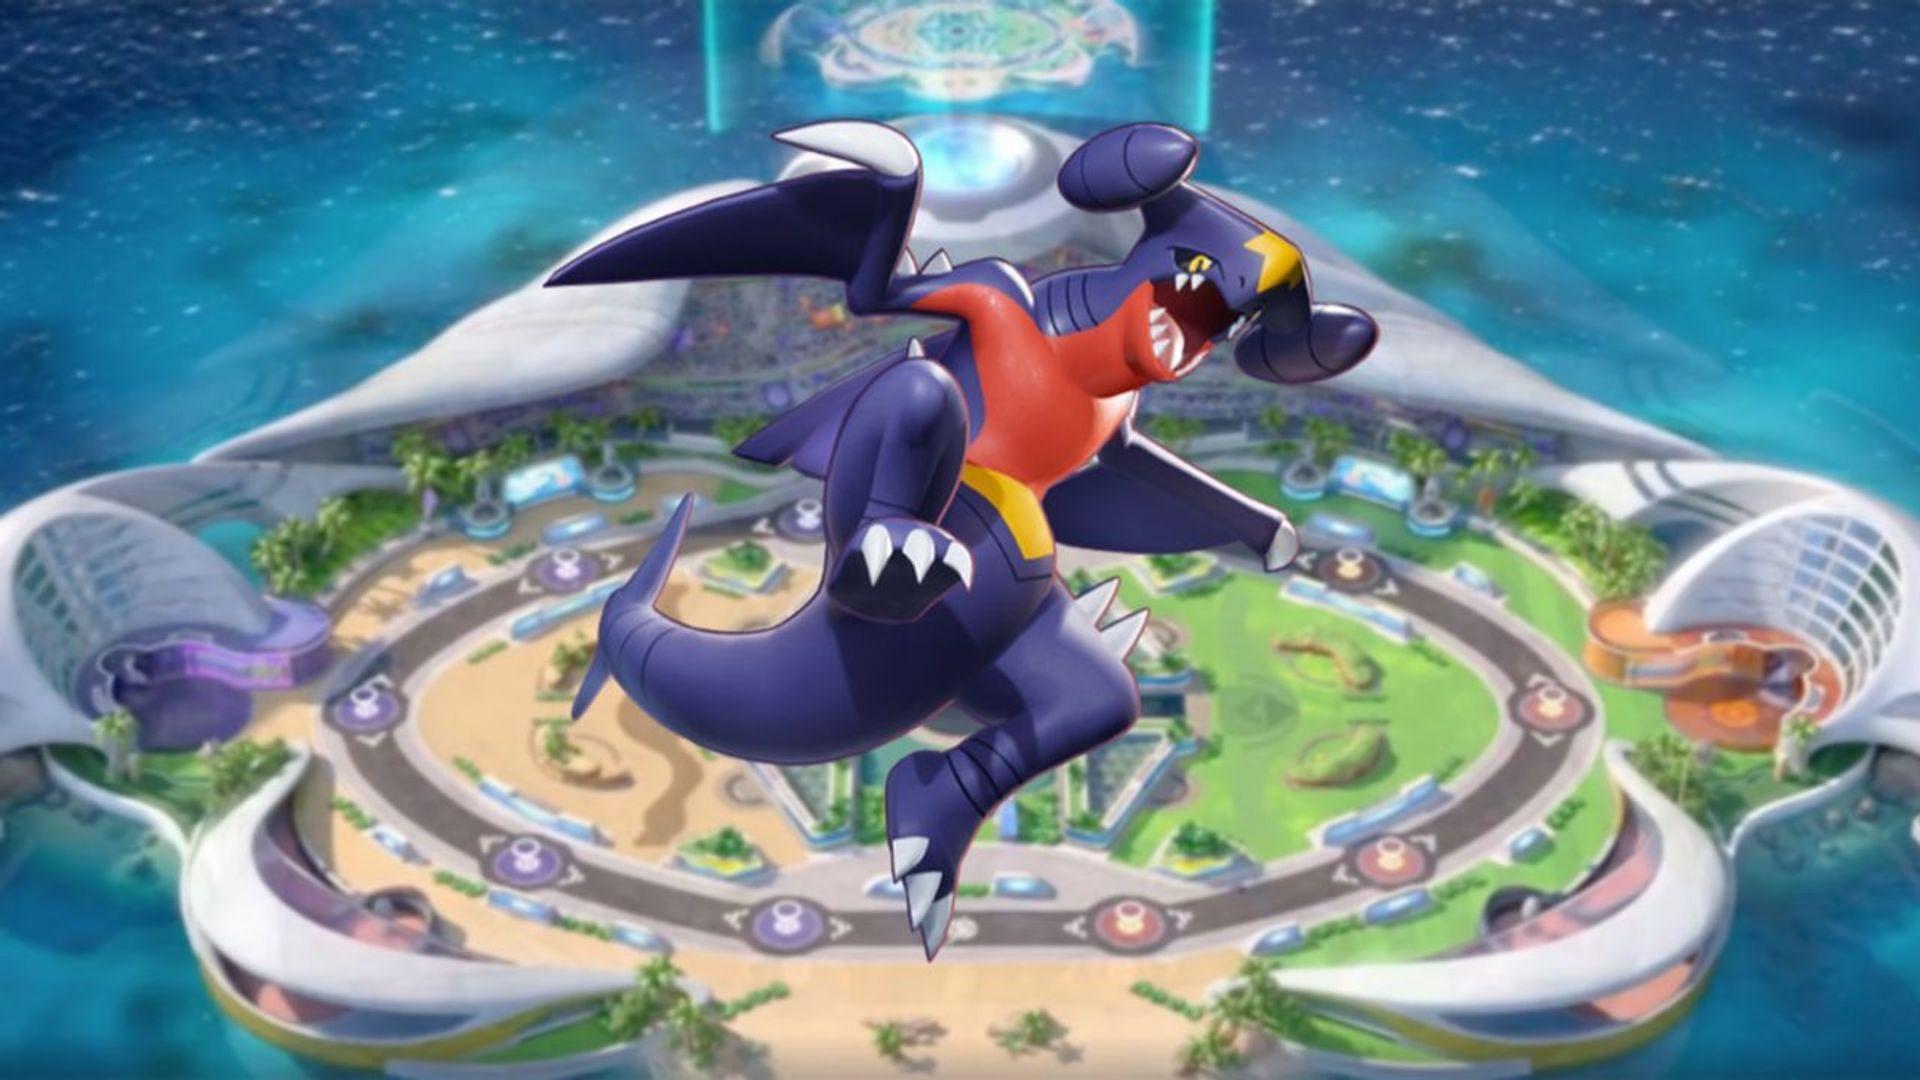 Garchomp's official render in Pokemon Unite (Image via The Pokemon Company)